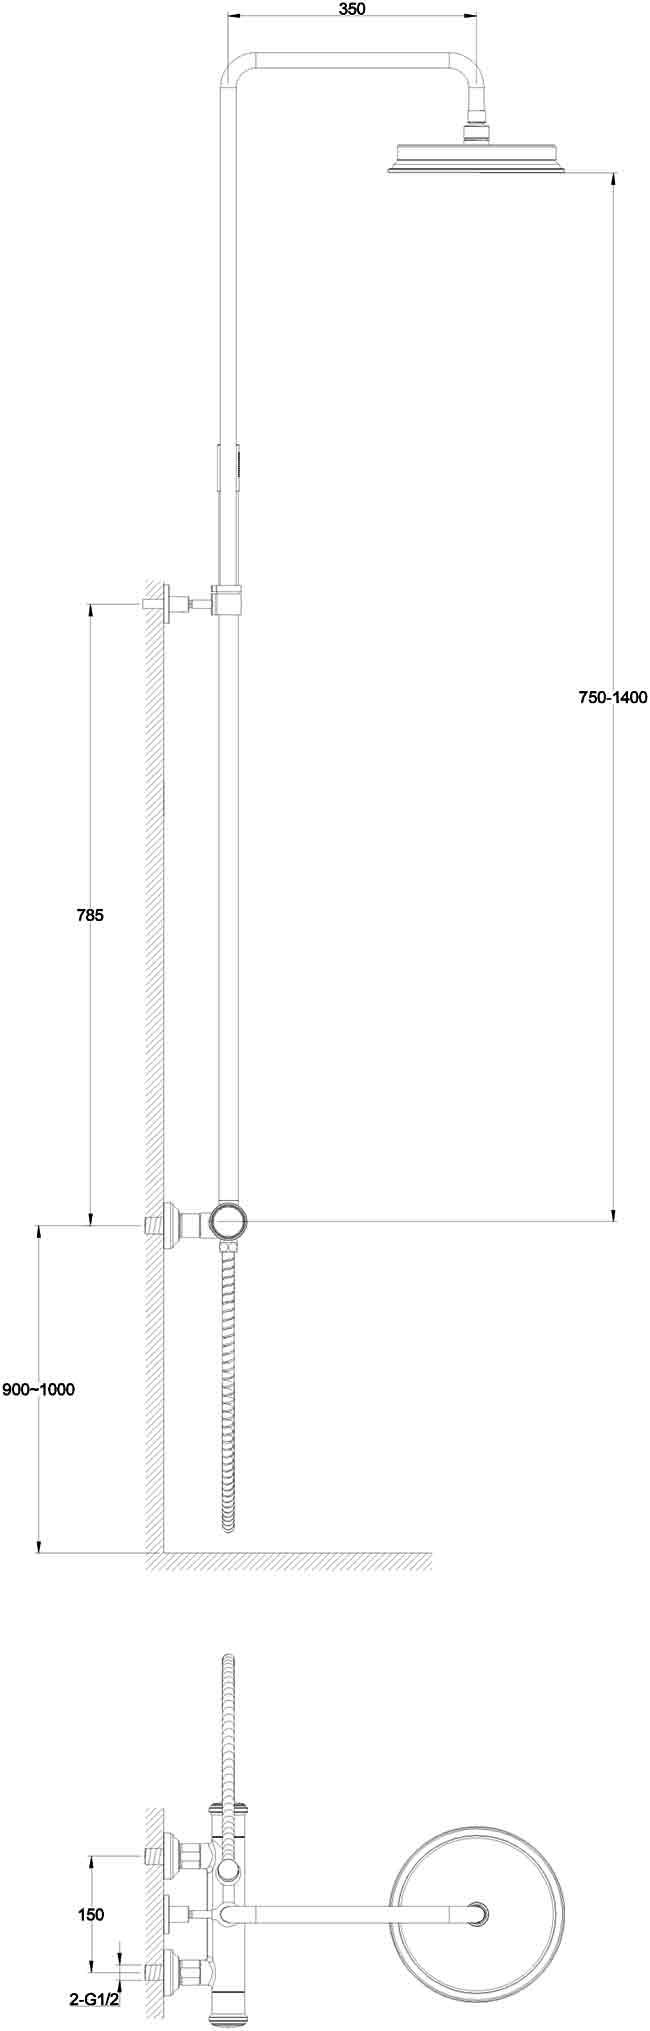 TECHNICAL DRAWING schéma SD101-7001